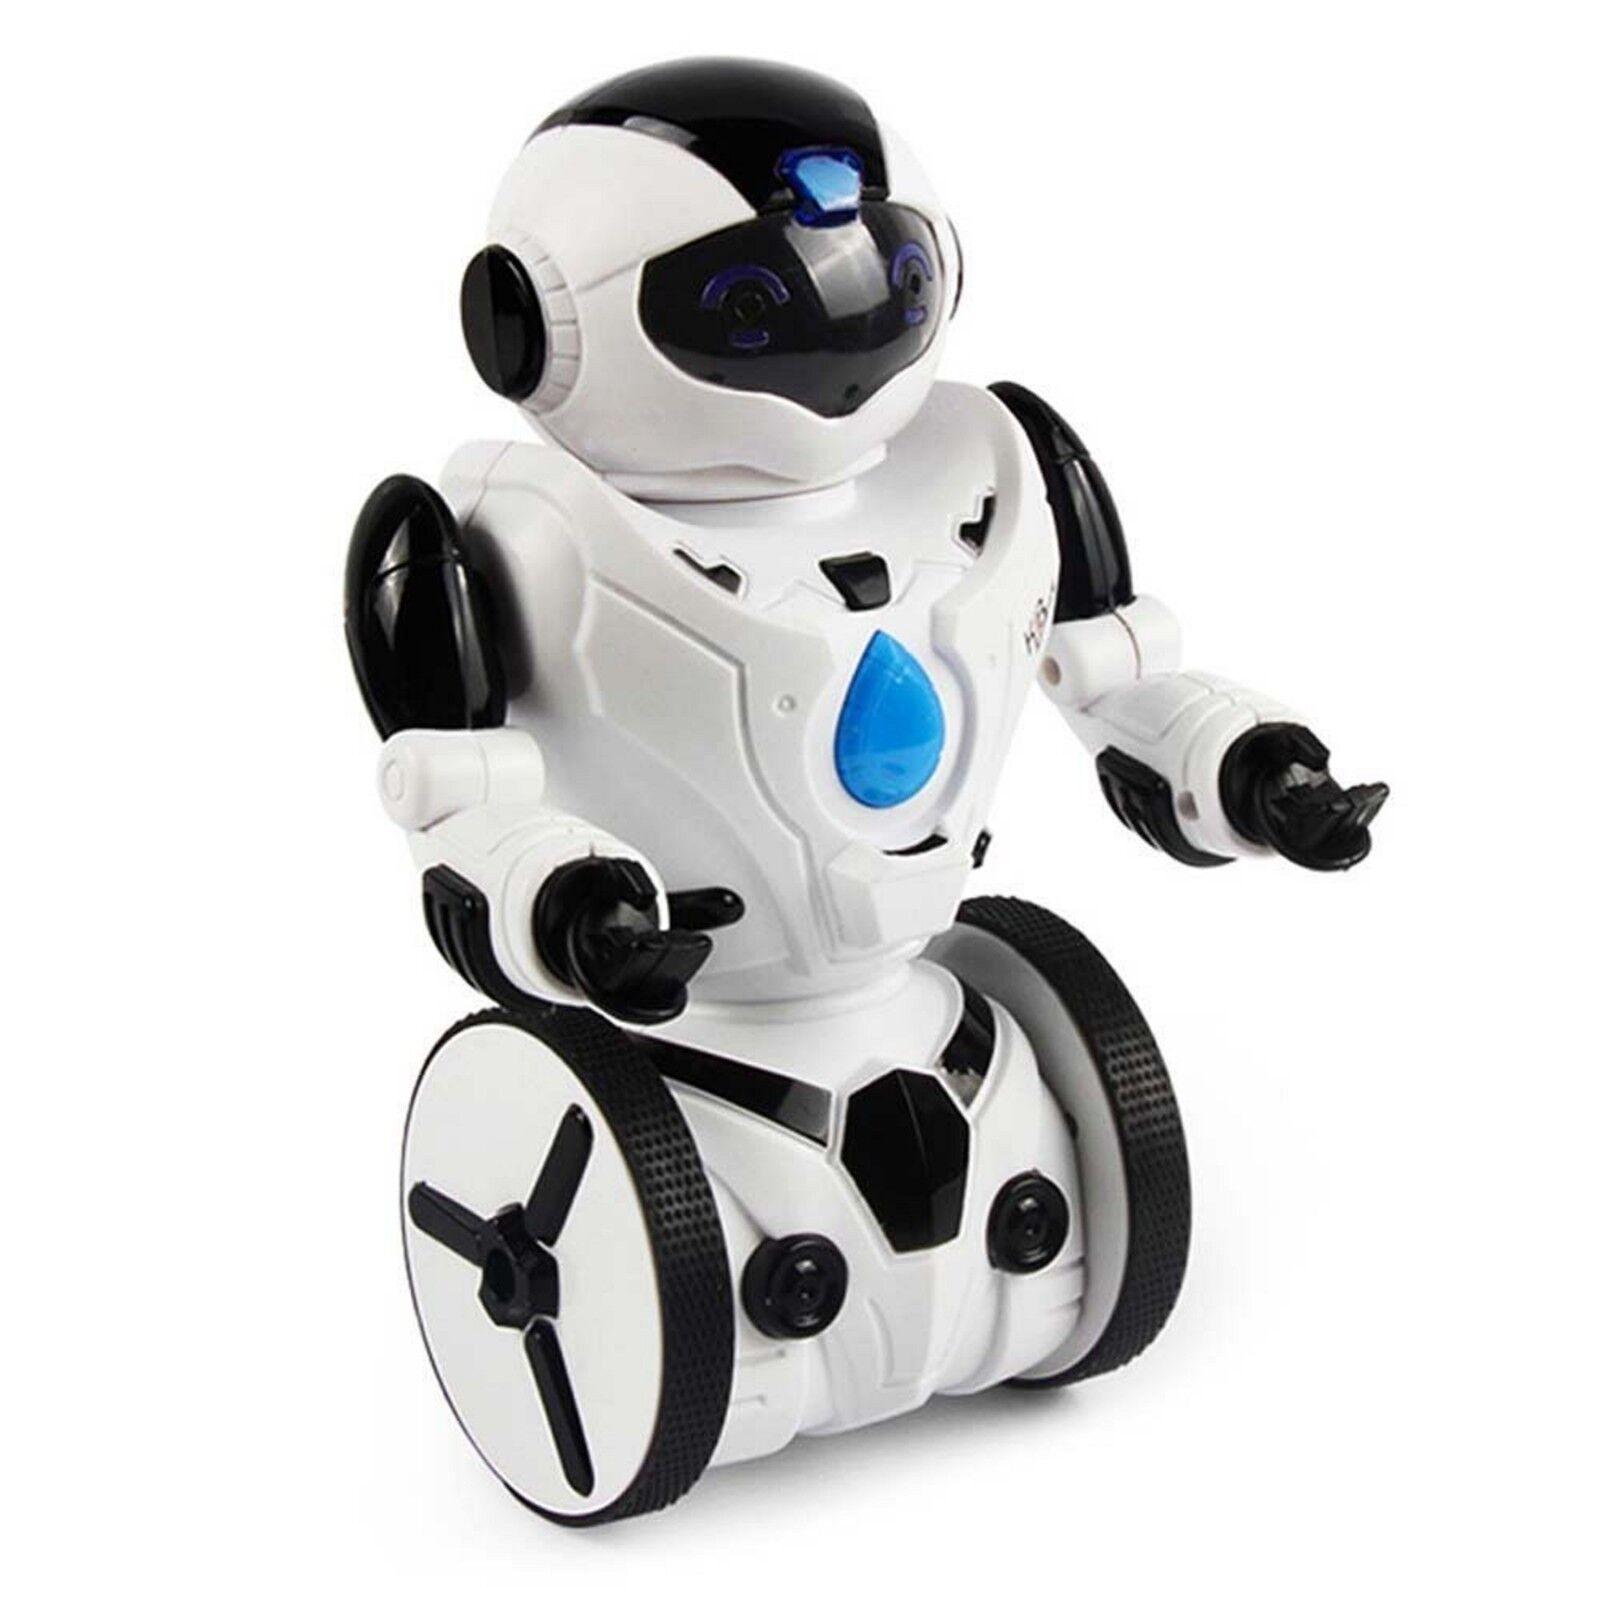 JXD 1016A KIB Intelligent Balance RC Remote Control Control Control Robot Ages 8+ nuovo giocattolo Gift 3cb4ae